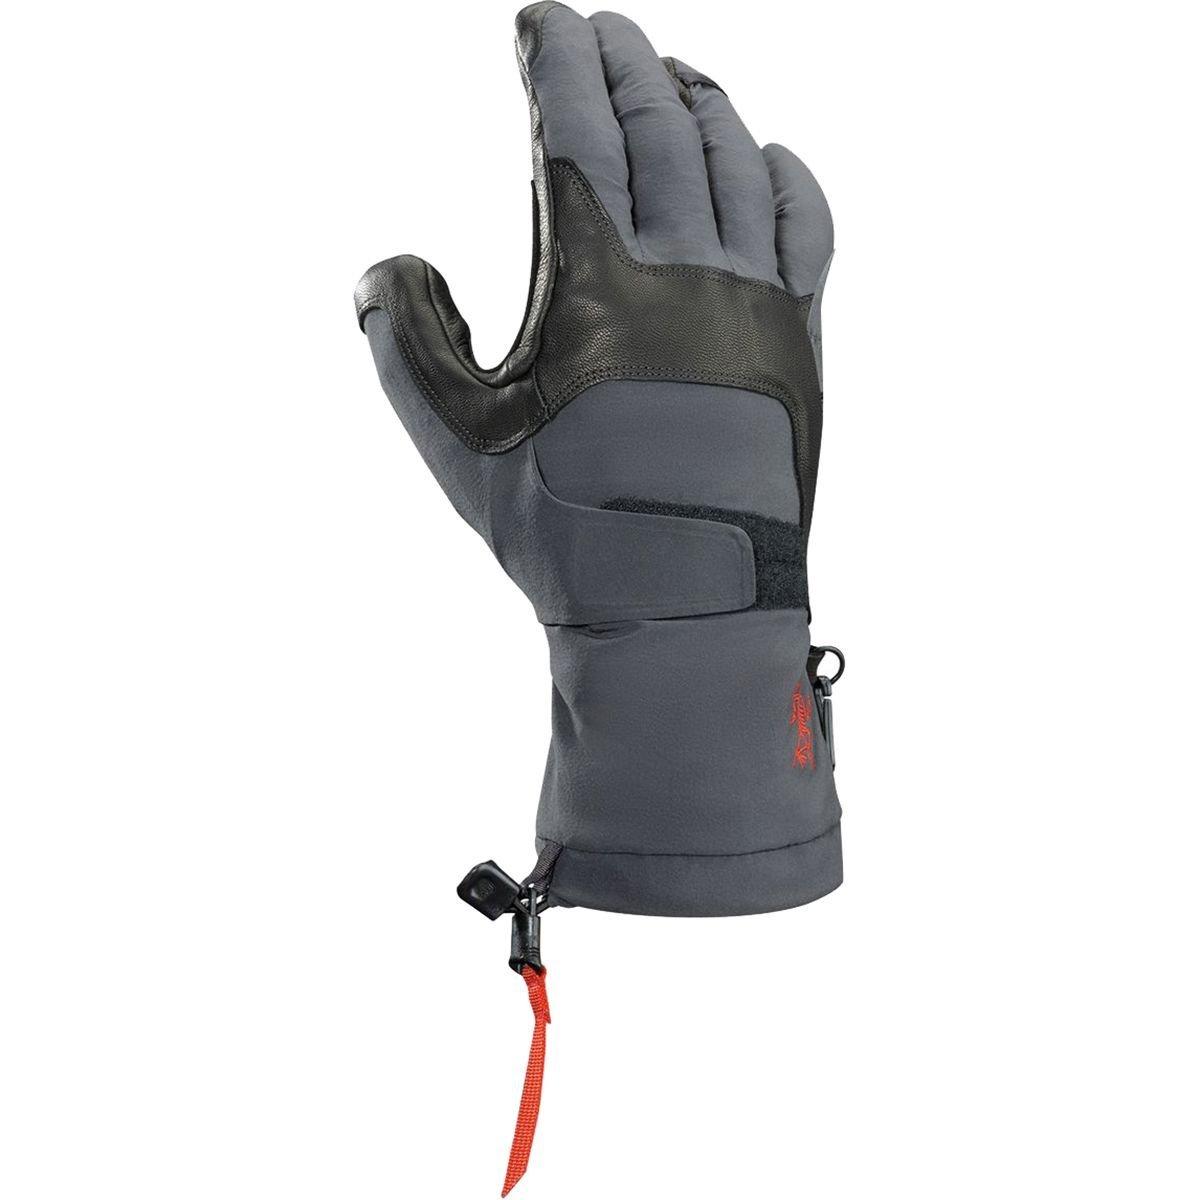 Arcteryx Alpha AR Ski Glove